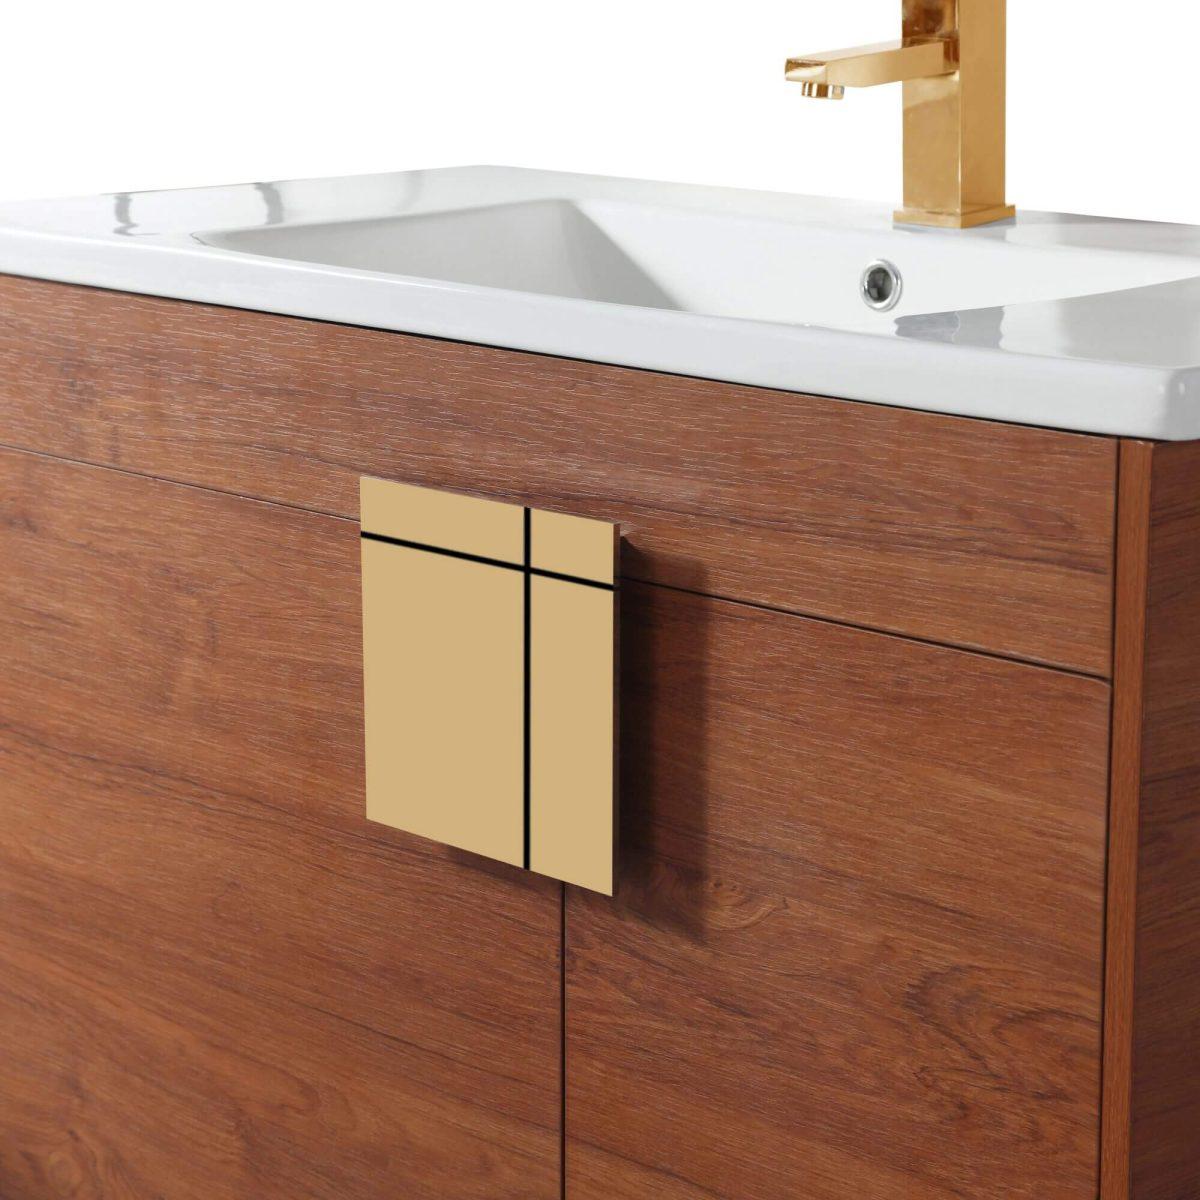 "Shawbridge 36"" Modern Bathroom Vanity  Spicy Walnut with Satin Brass Hardware"